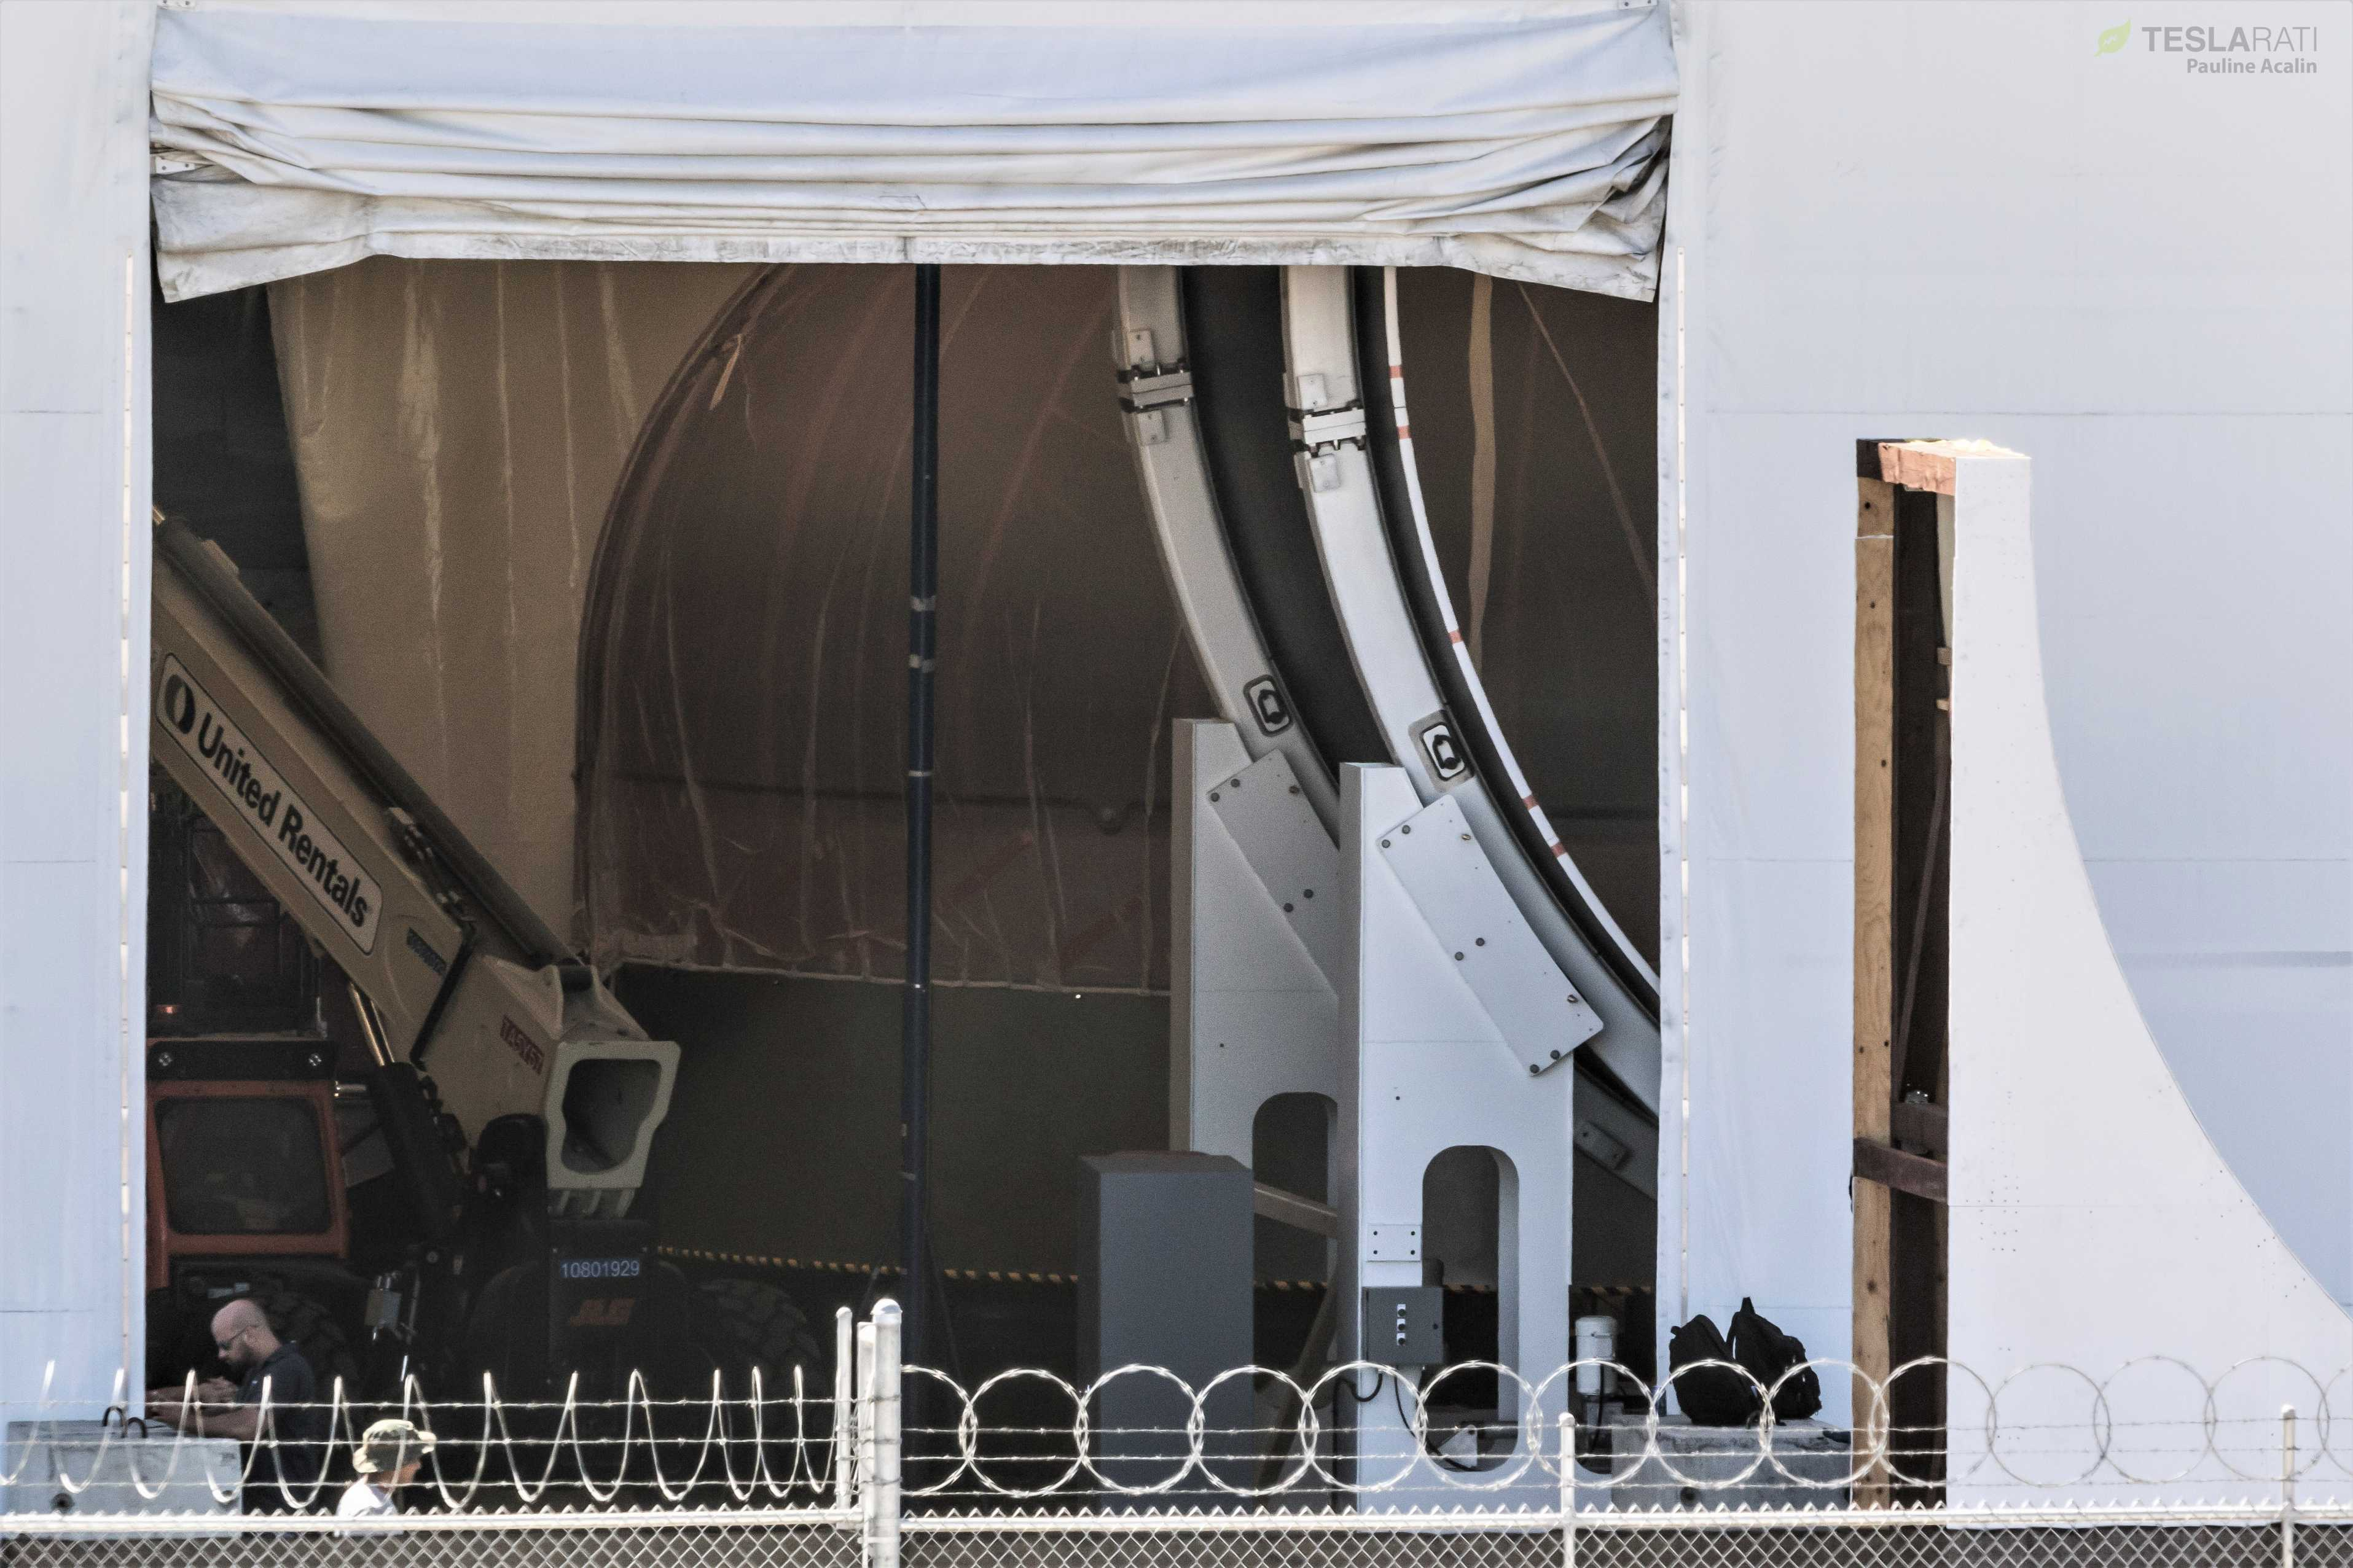 BFR tent completed segment 091818 (Pauline Acalin) (3)(c)